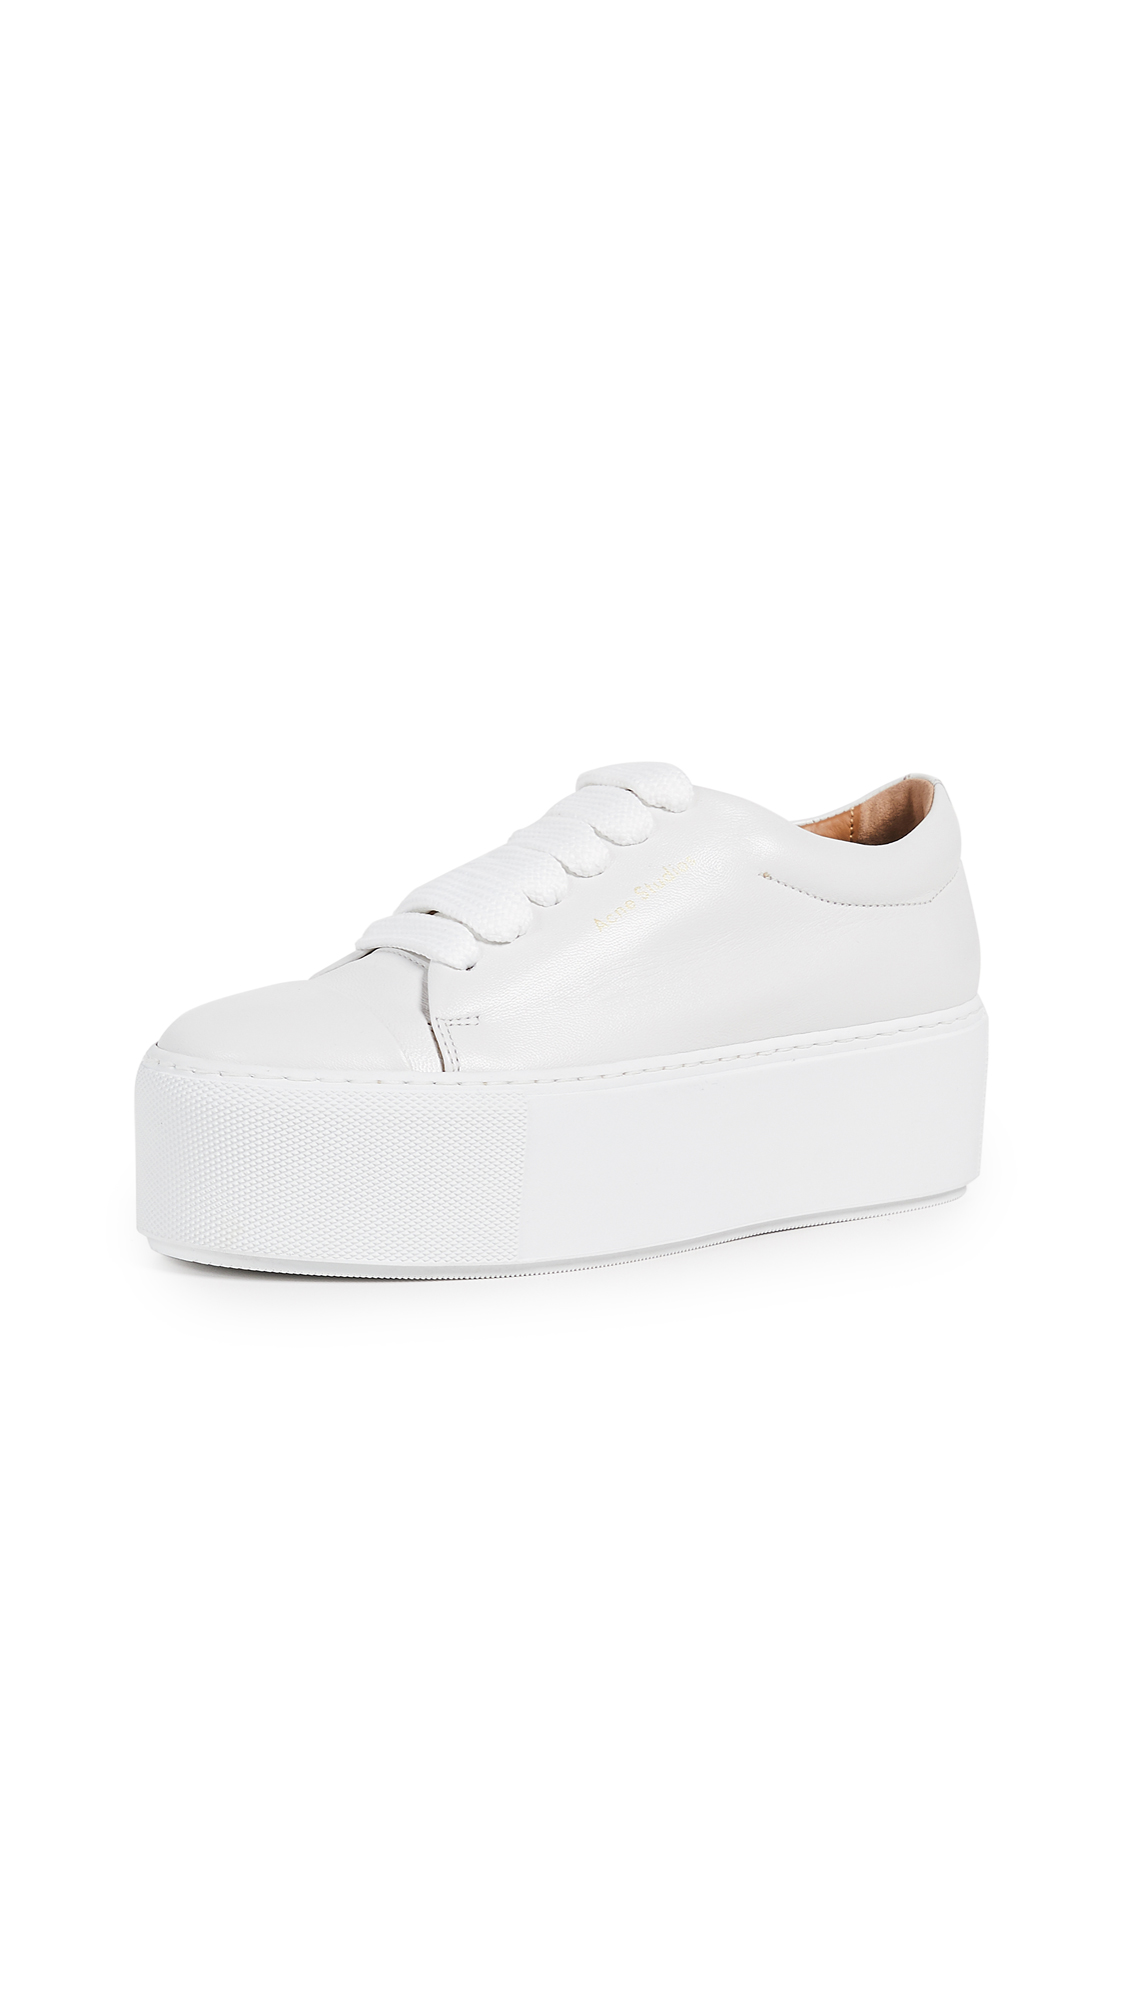 Acne Studios Drihanna Logo Sneakers - White/White